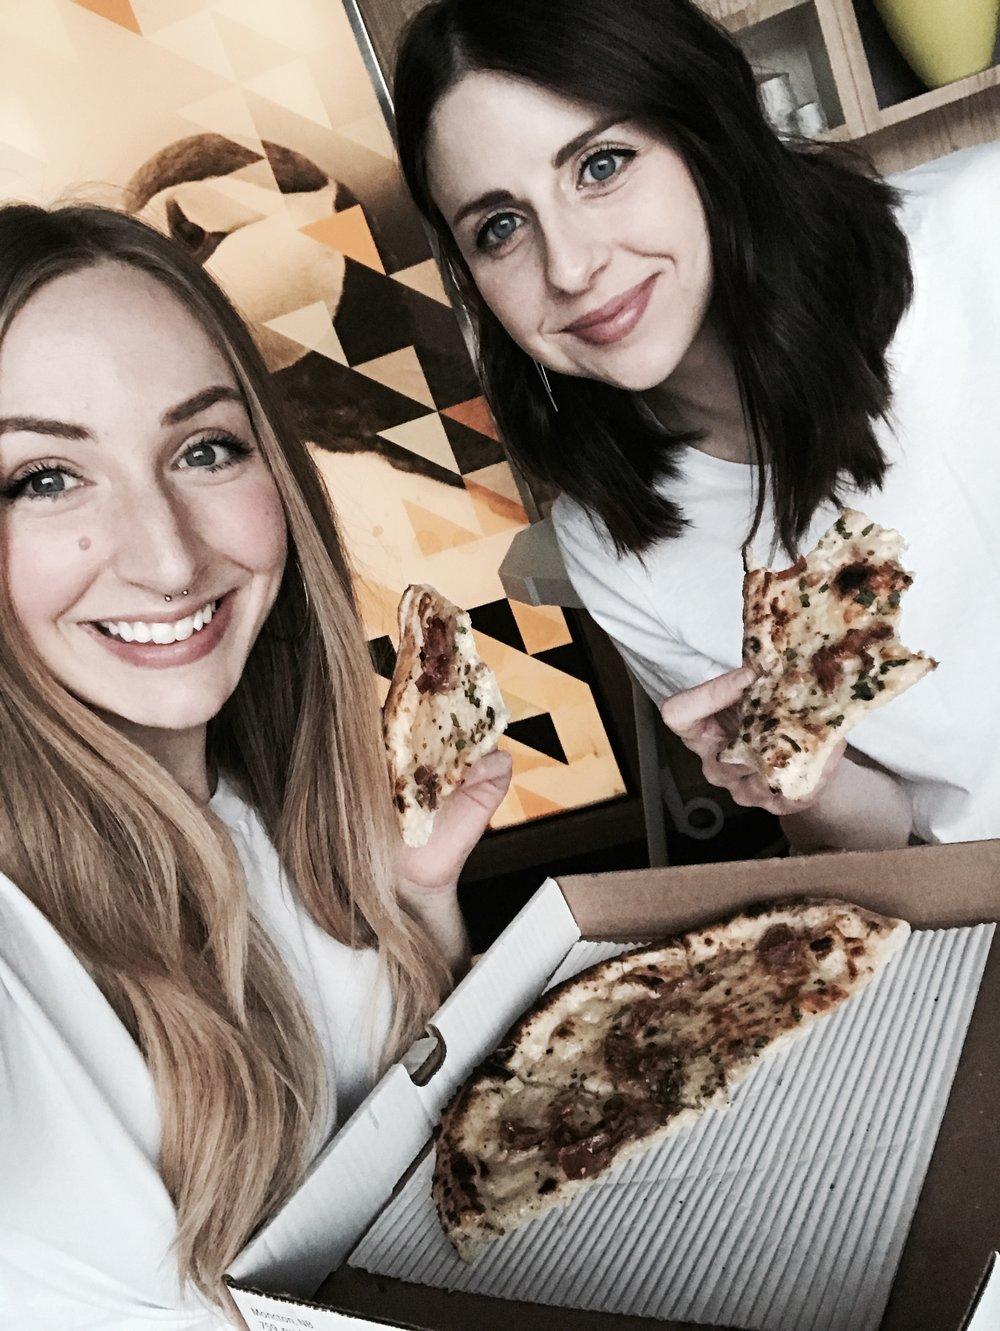 pizza6.jpg